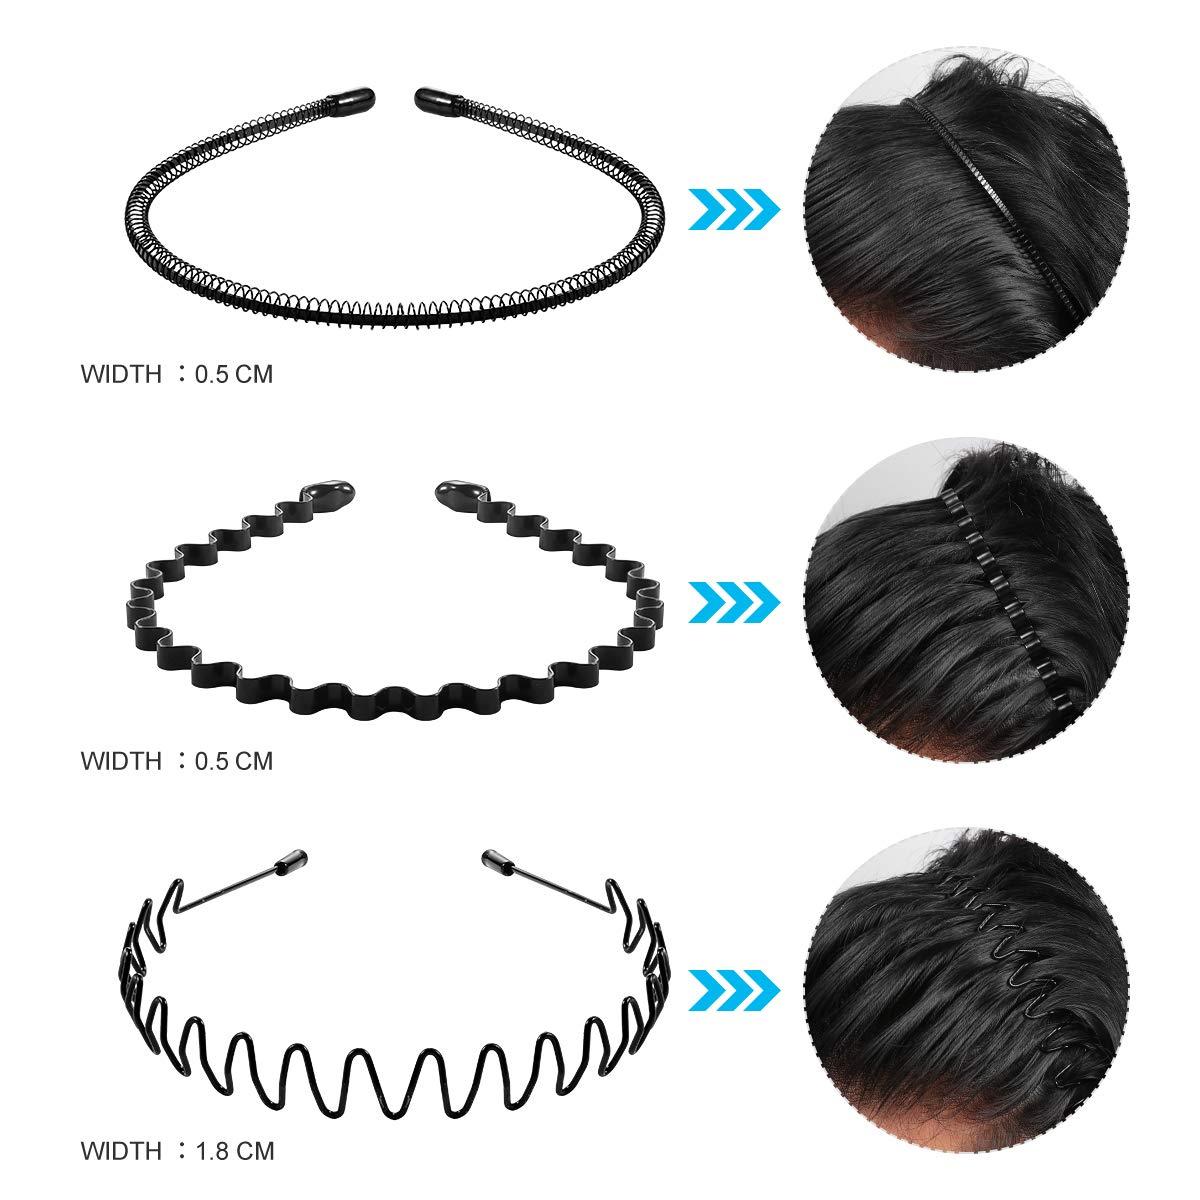 Unisex Wavy Women Headband Cute Headbands for women Hair Accessories Hair Bands for Women, 6Pcs